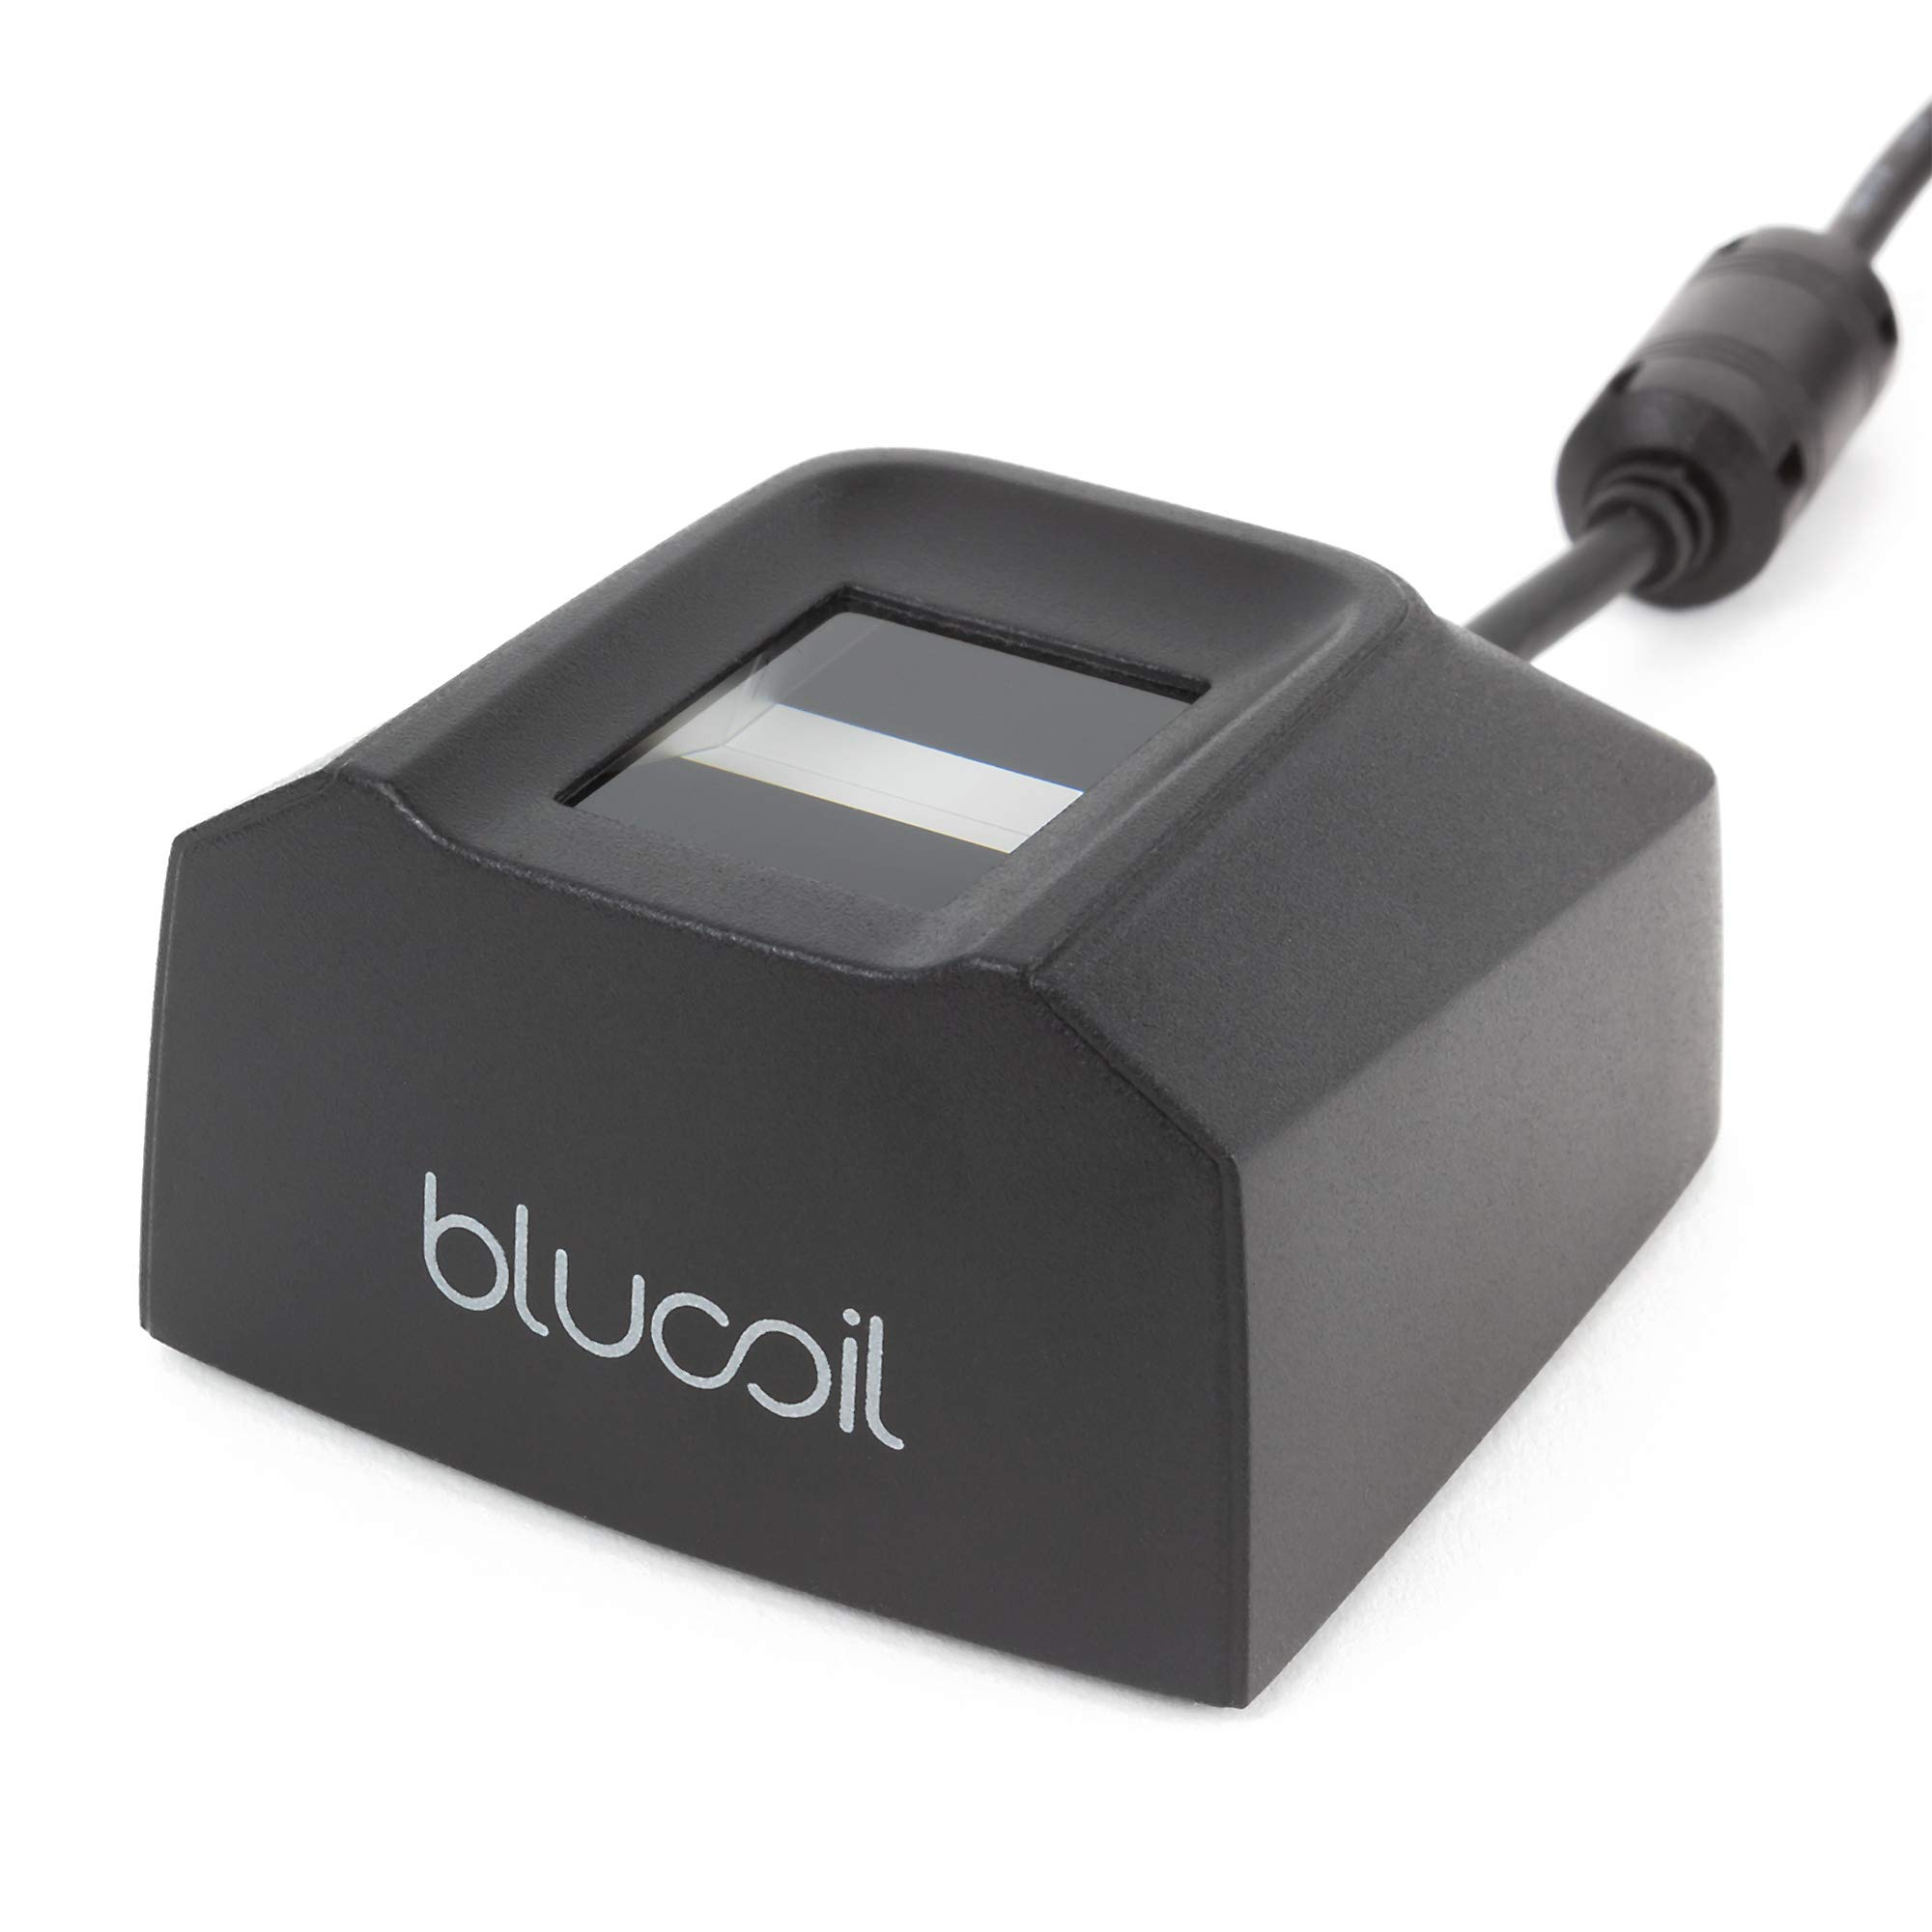 blucoil Secugen Hamster Pro 20 Optical USB Fingerprint Scanner